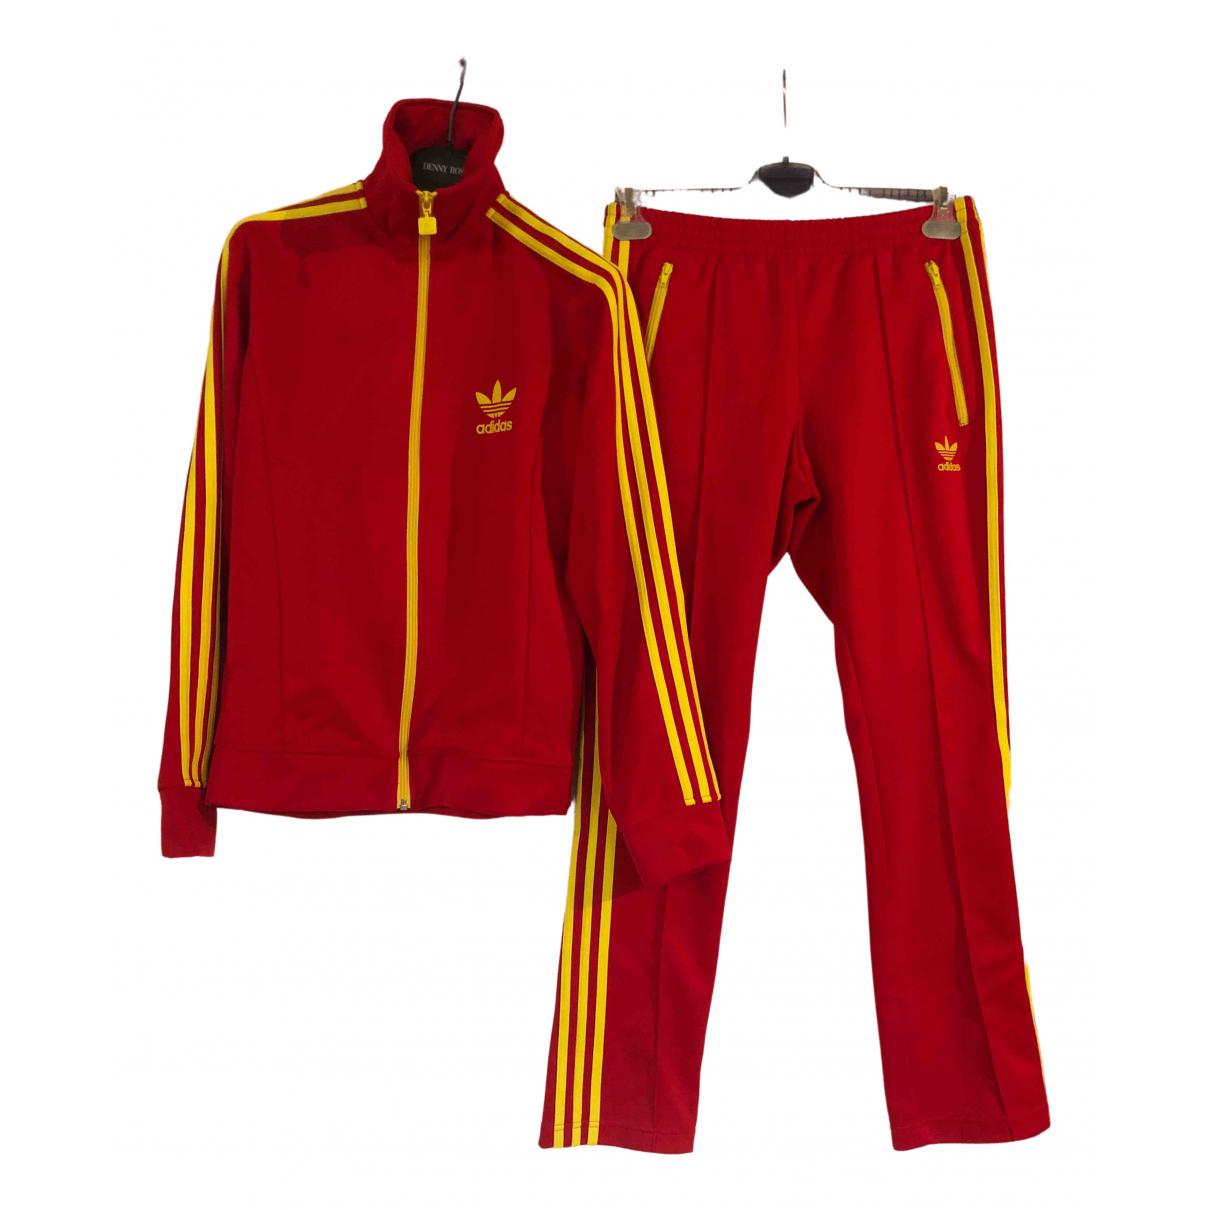 Adidas \N Kleid in  Rot Polyester